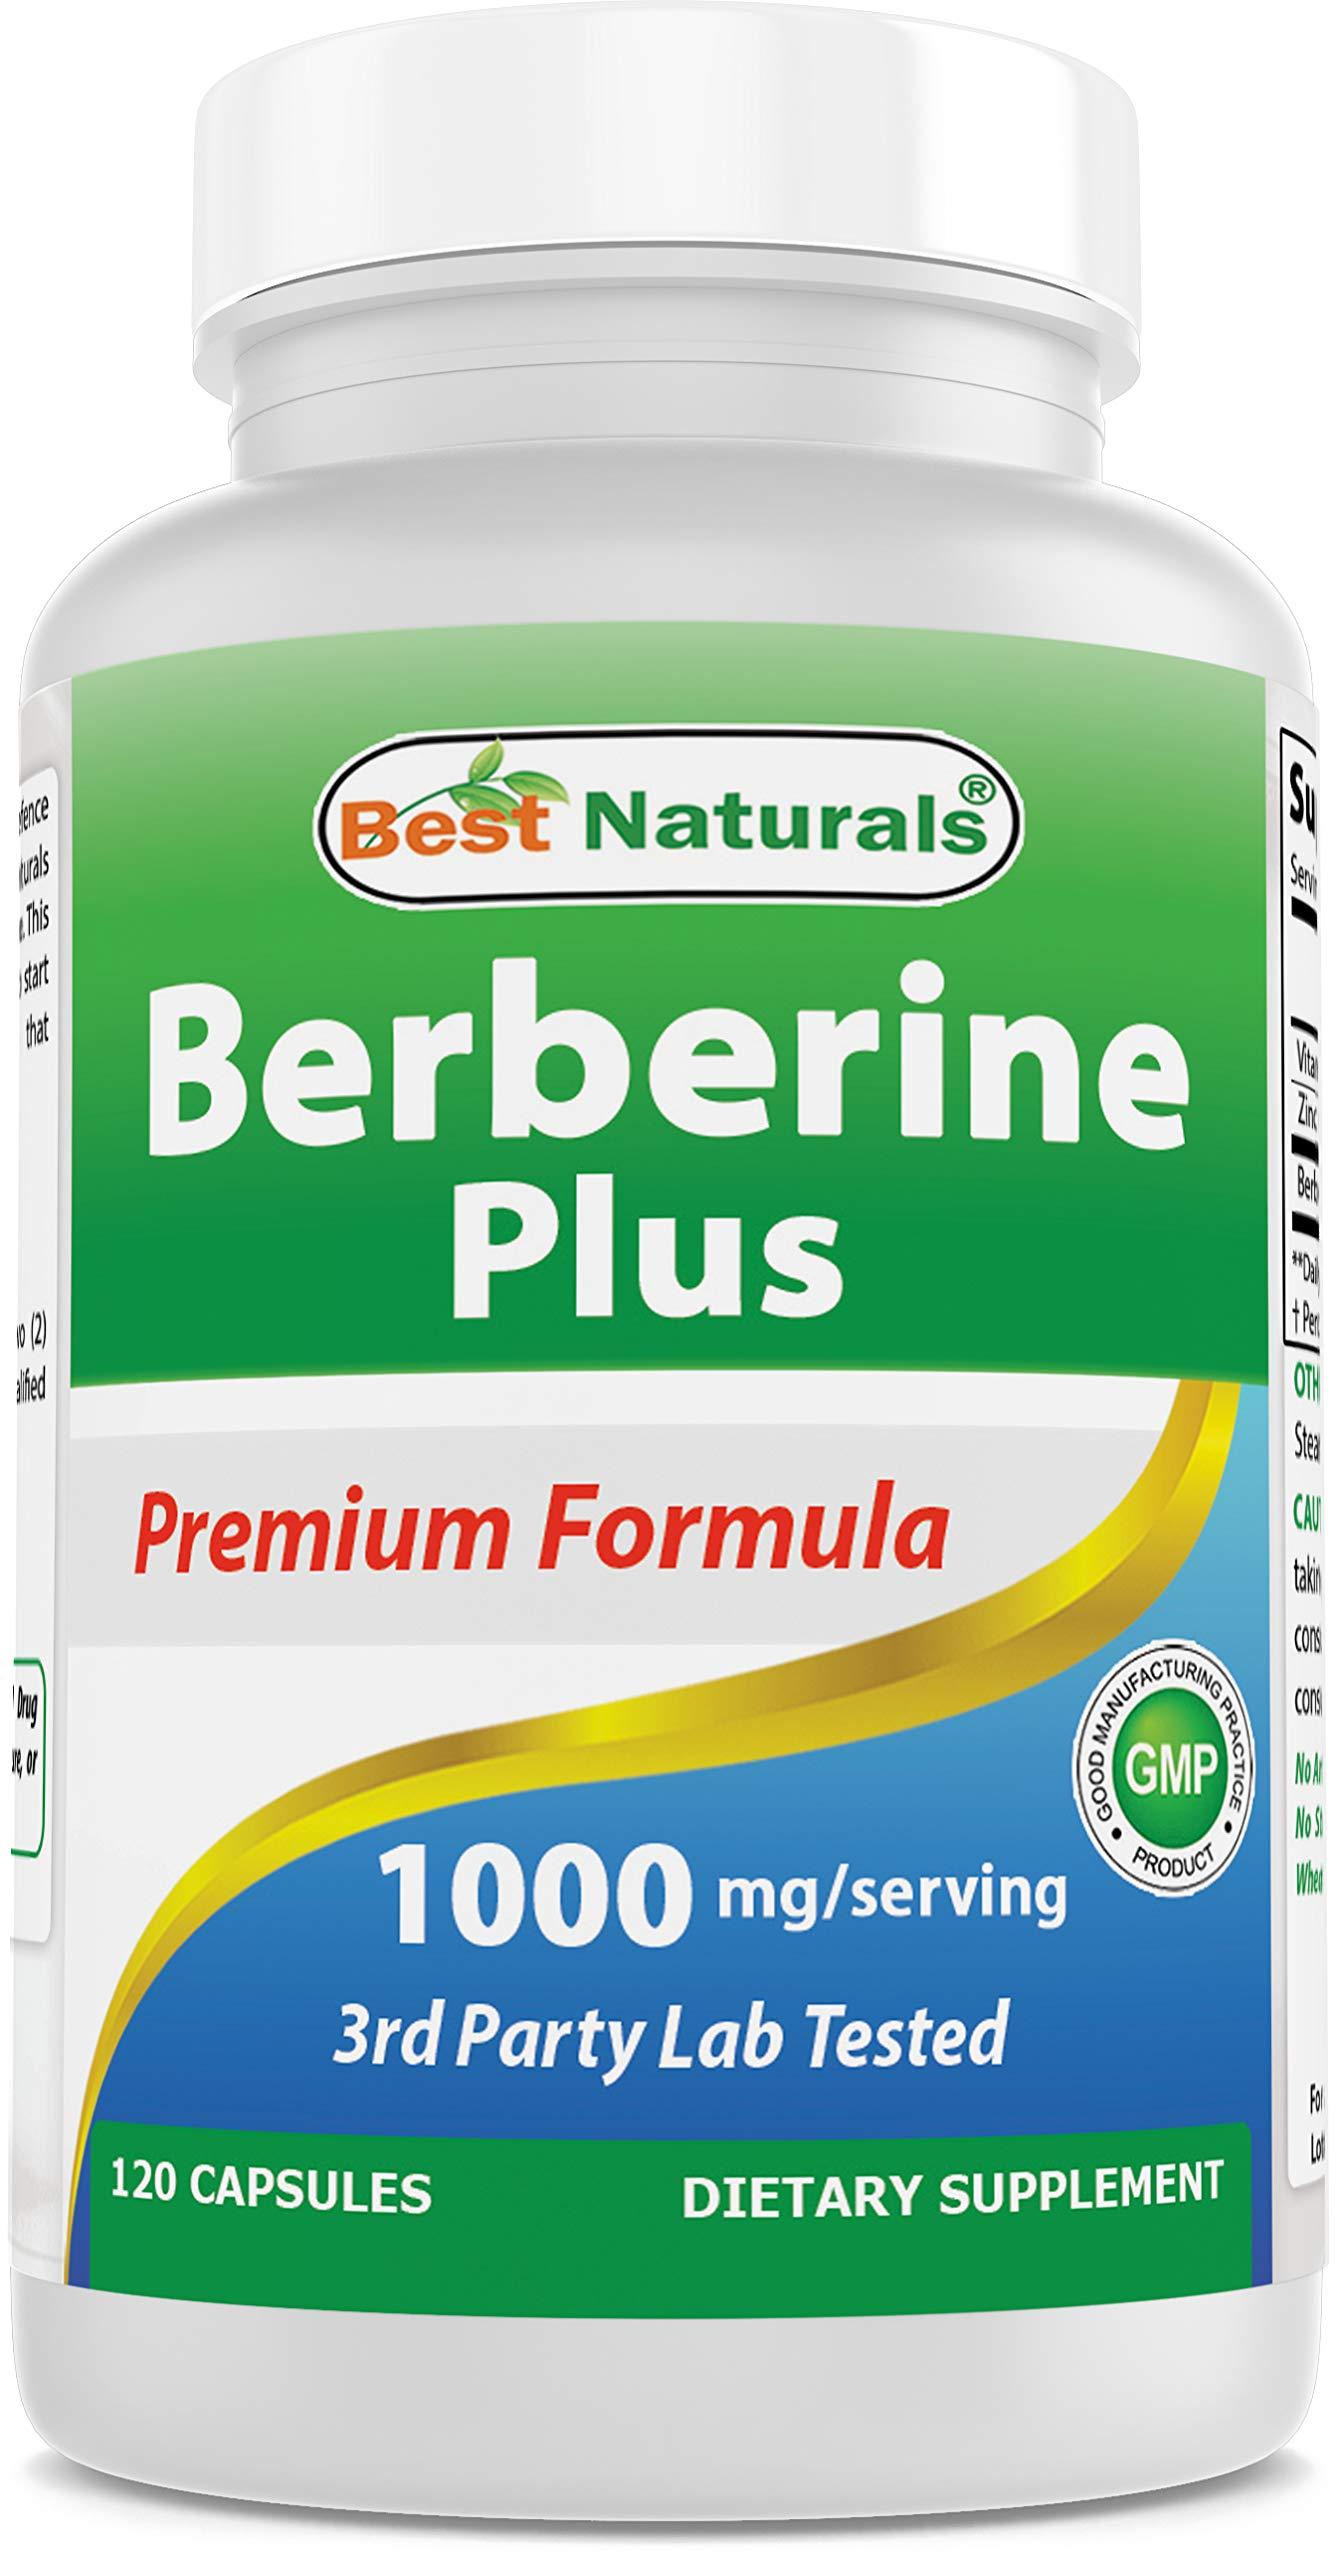 Best Naturals Berberine Plus 1000mg/Serving 120 Capsules - Promotes Healthy Healthy Glucose Metabolism & Immune Function - Contains Vitamin C & Zinc Gluconate